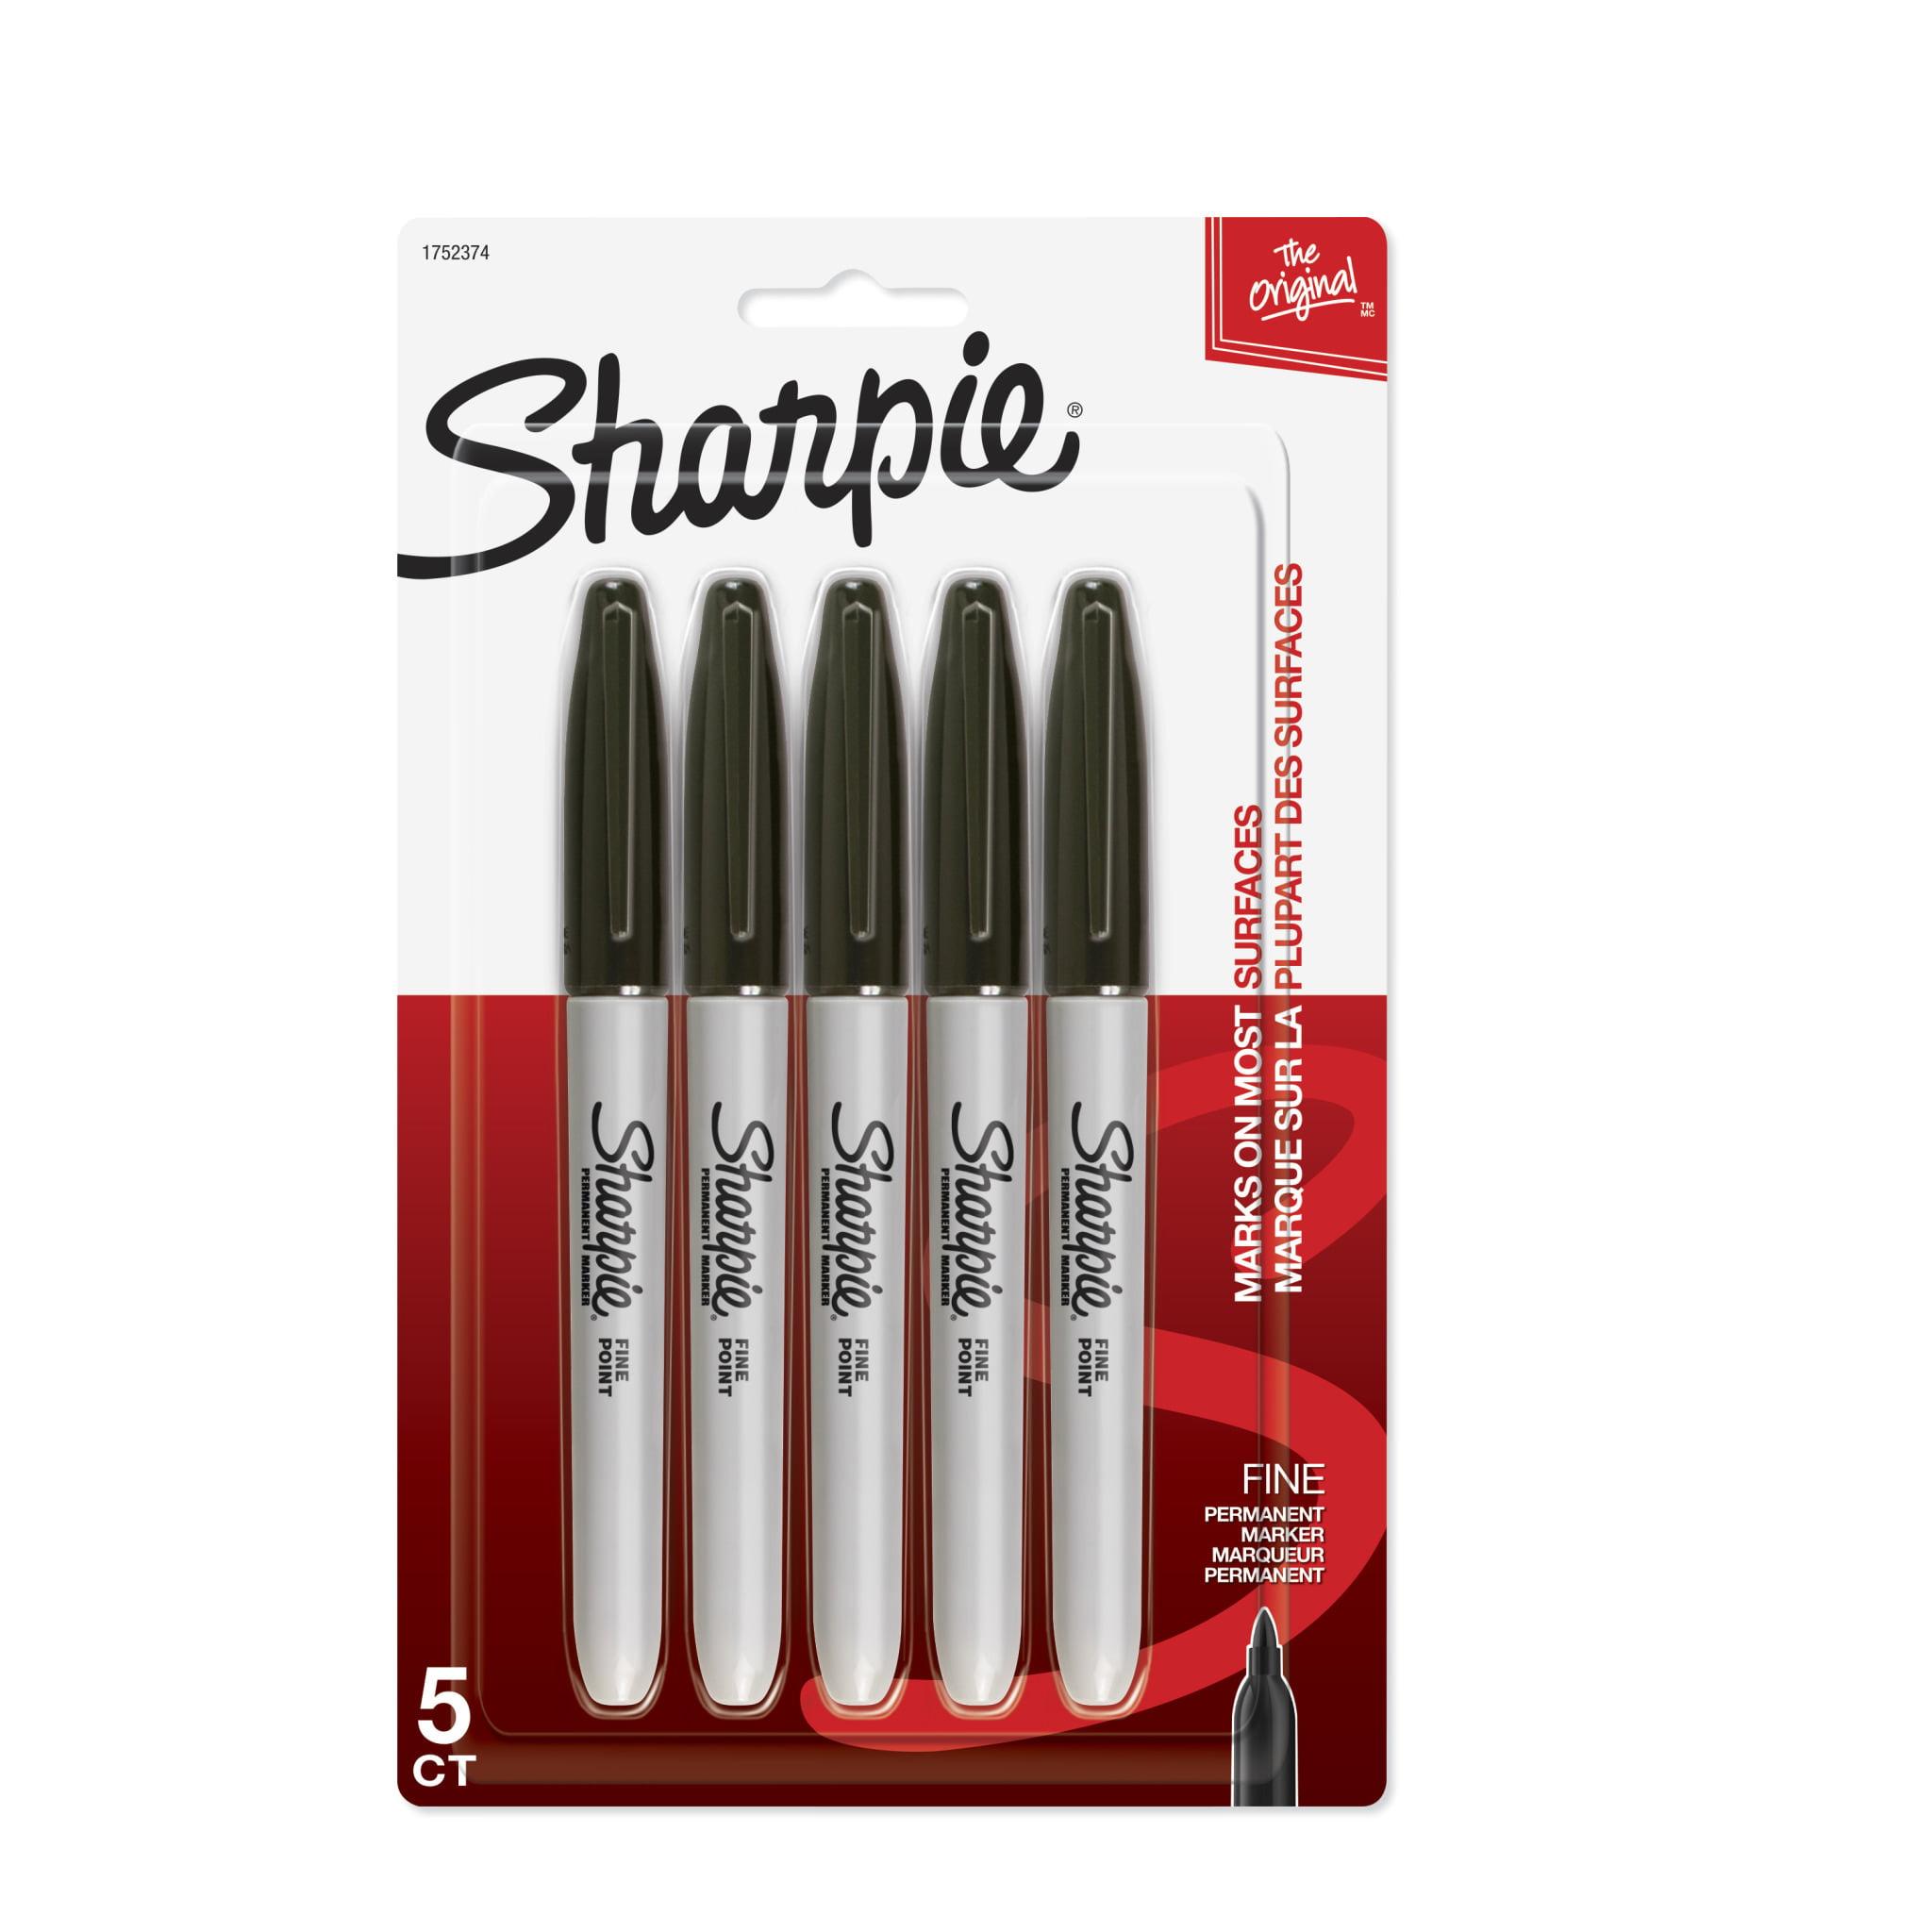 Sharpie Permanent Markers, Fine Point, Black, 5 Count